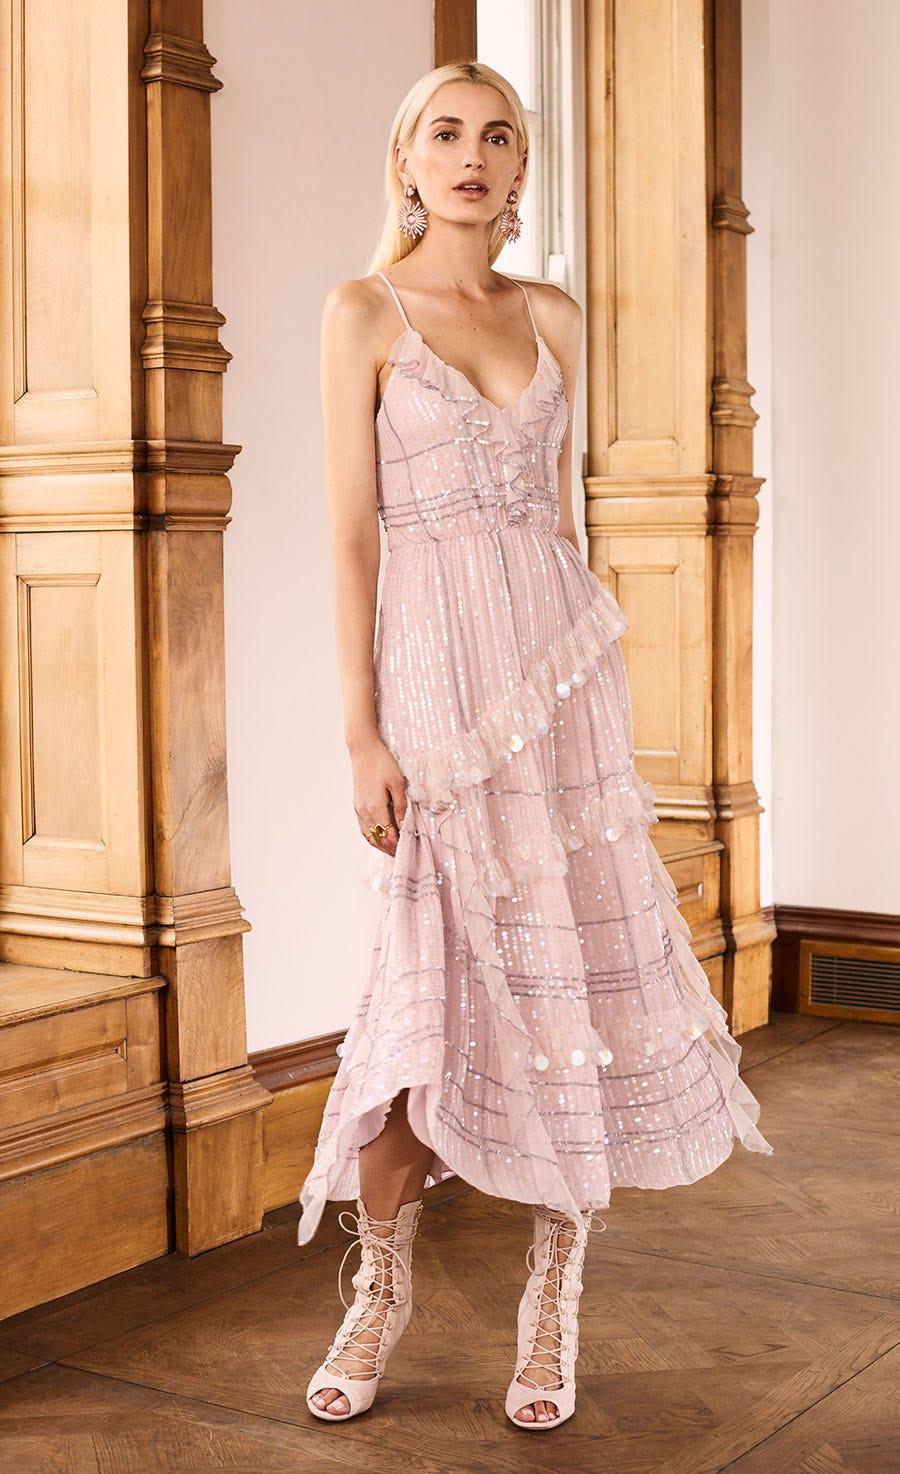 Sylvan Strappy Dress